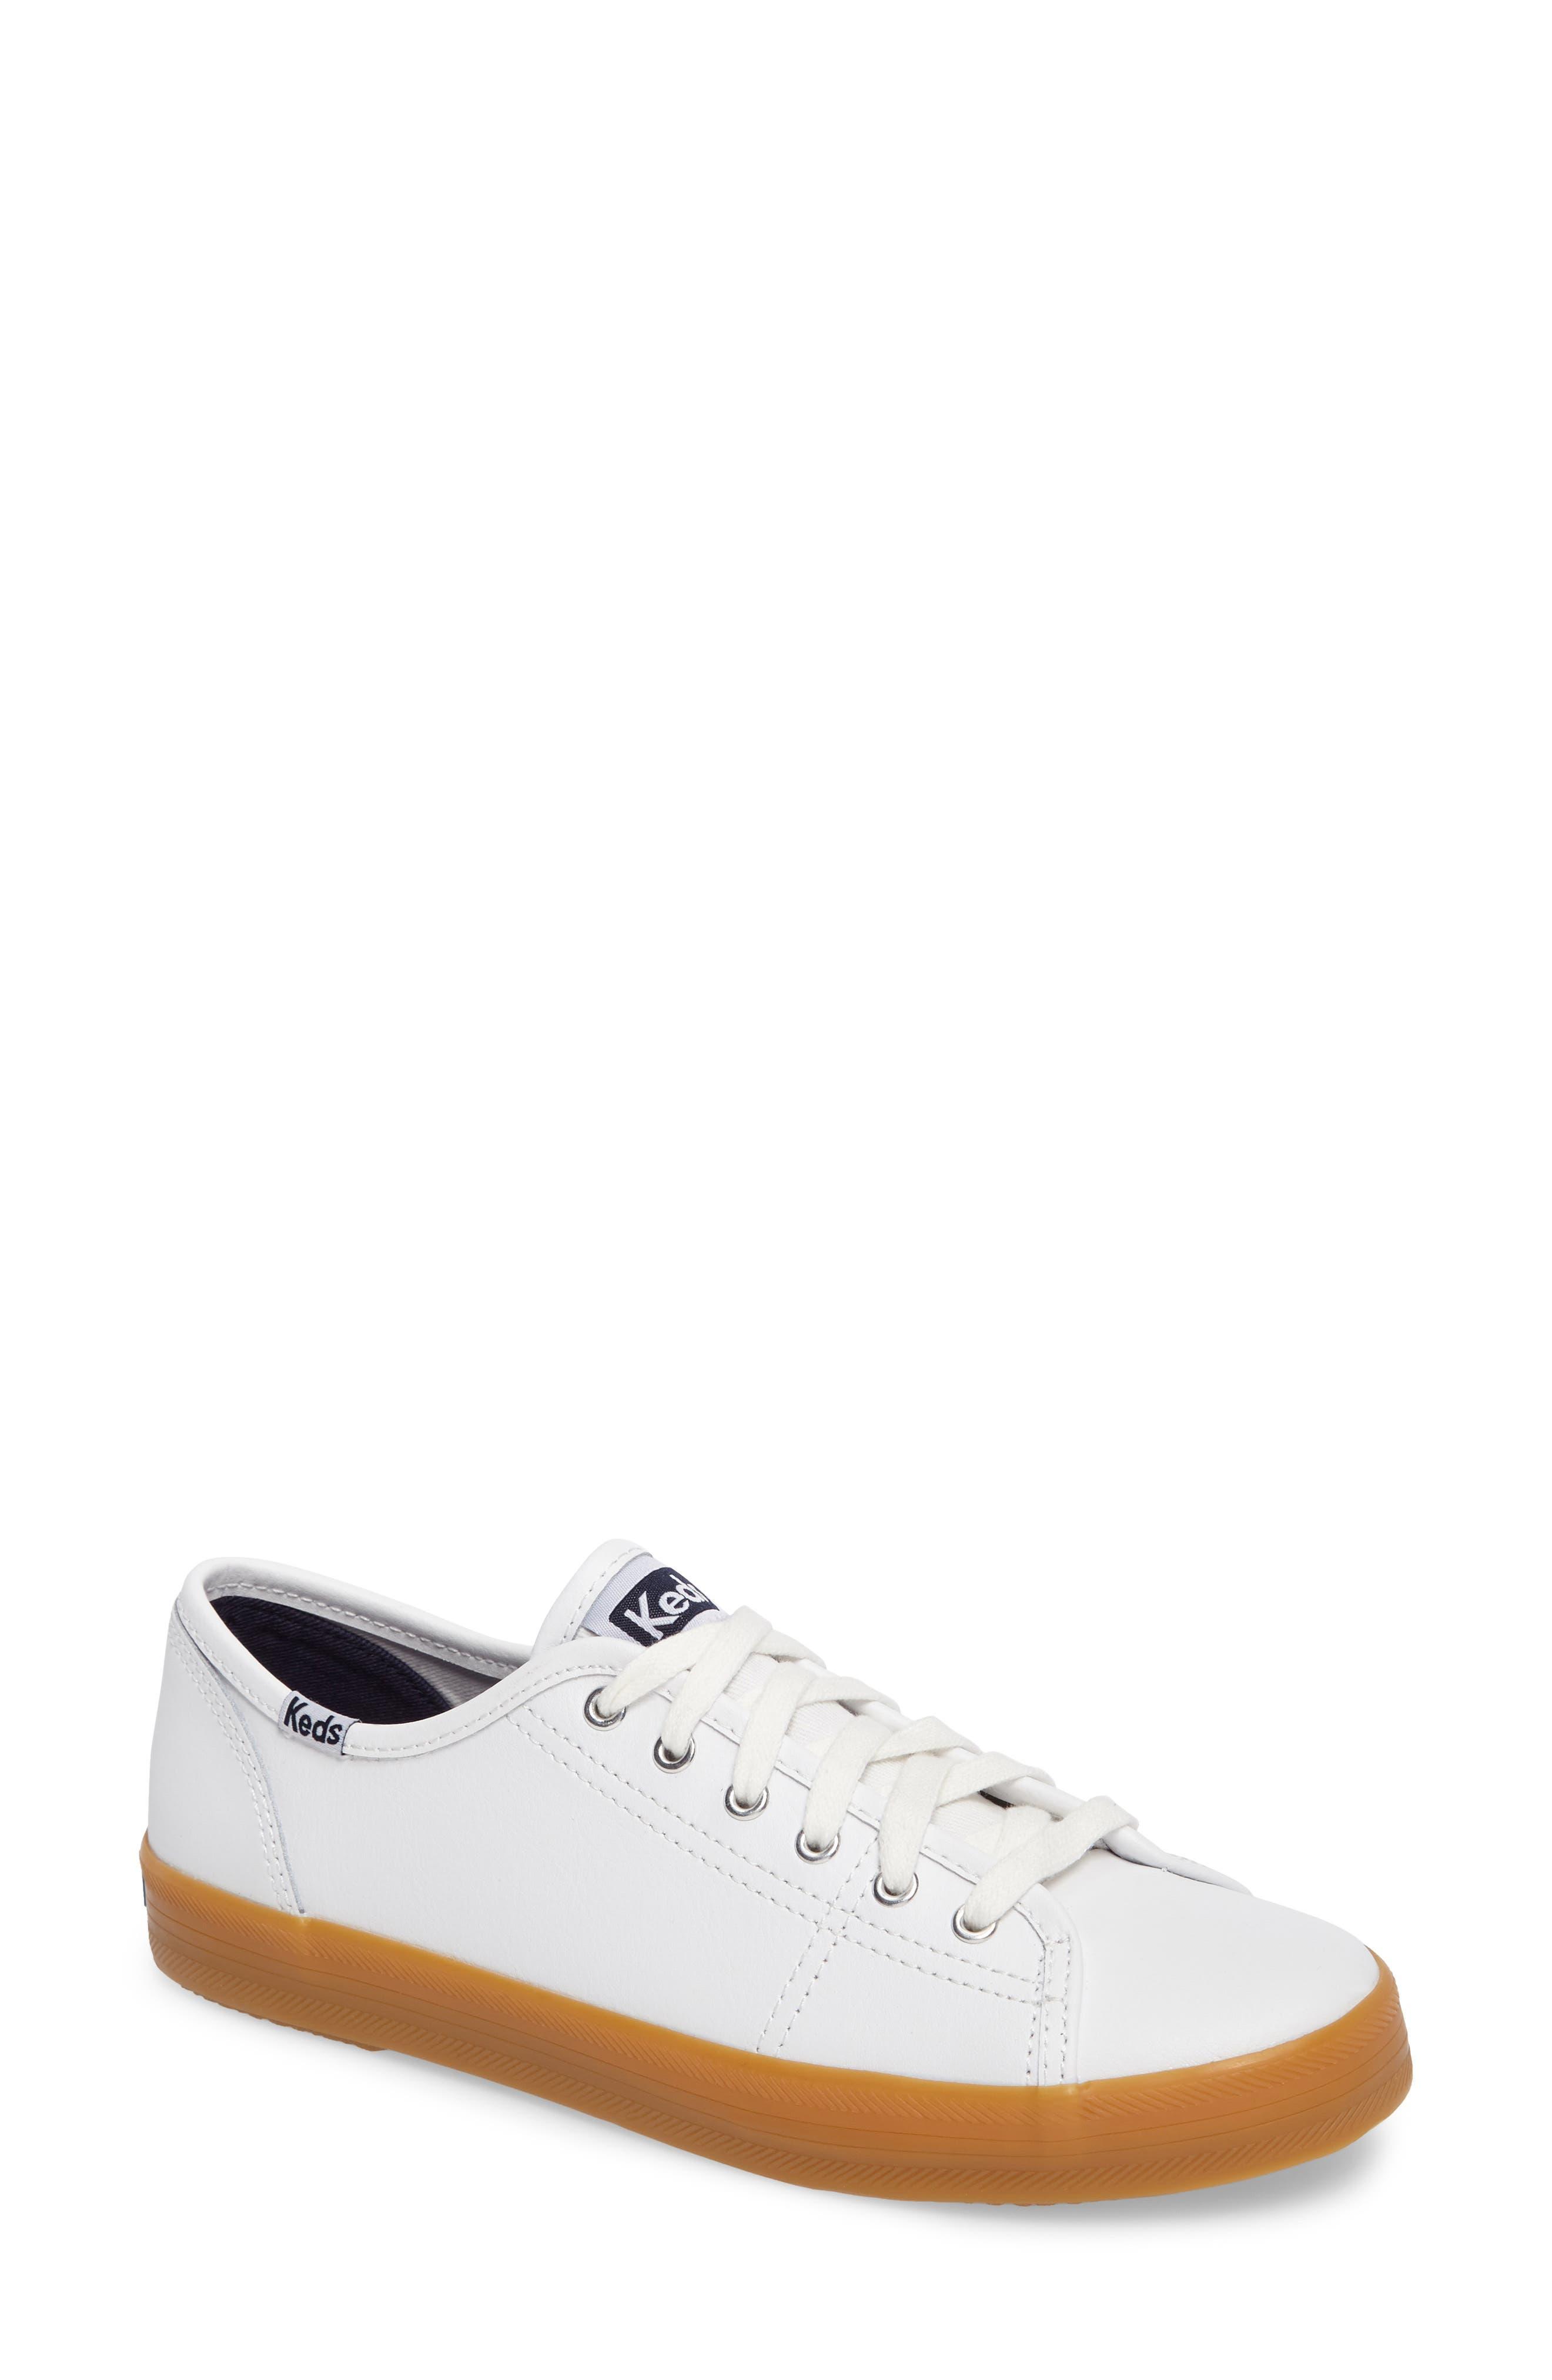 Alternate Image 1 Selected - Keds® Kickstart Sneaker (Women)